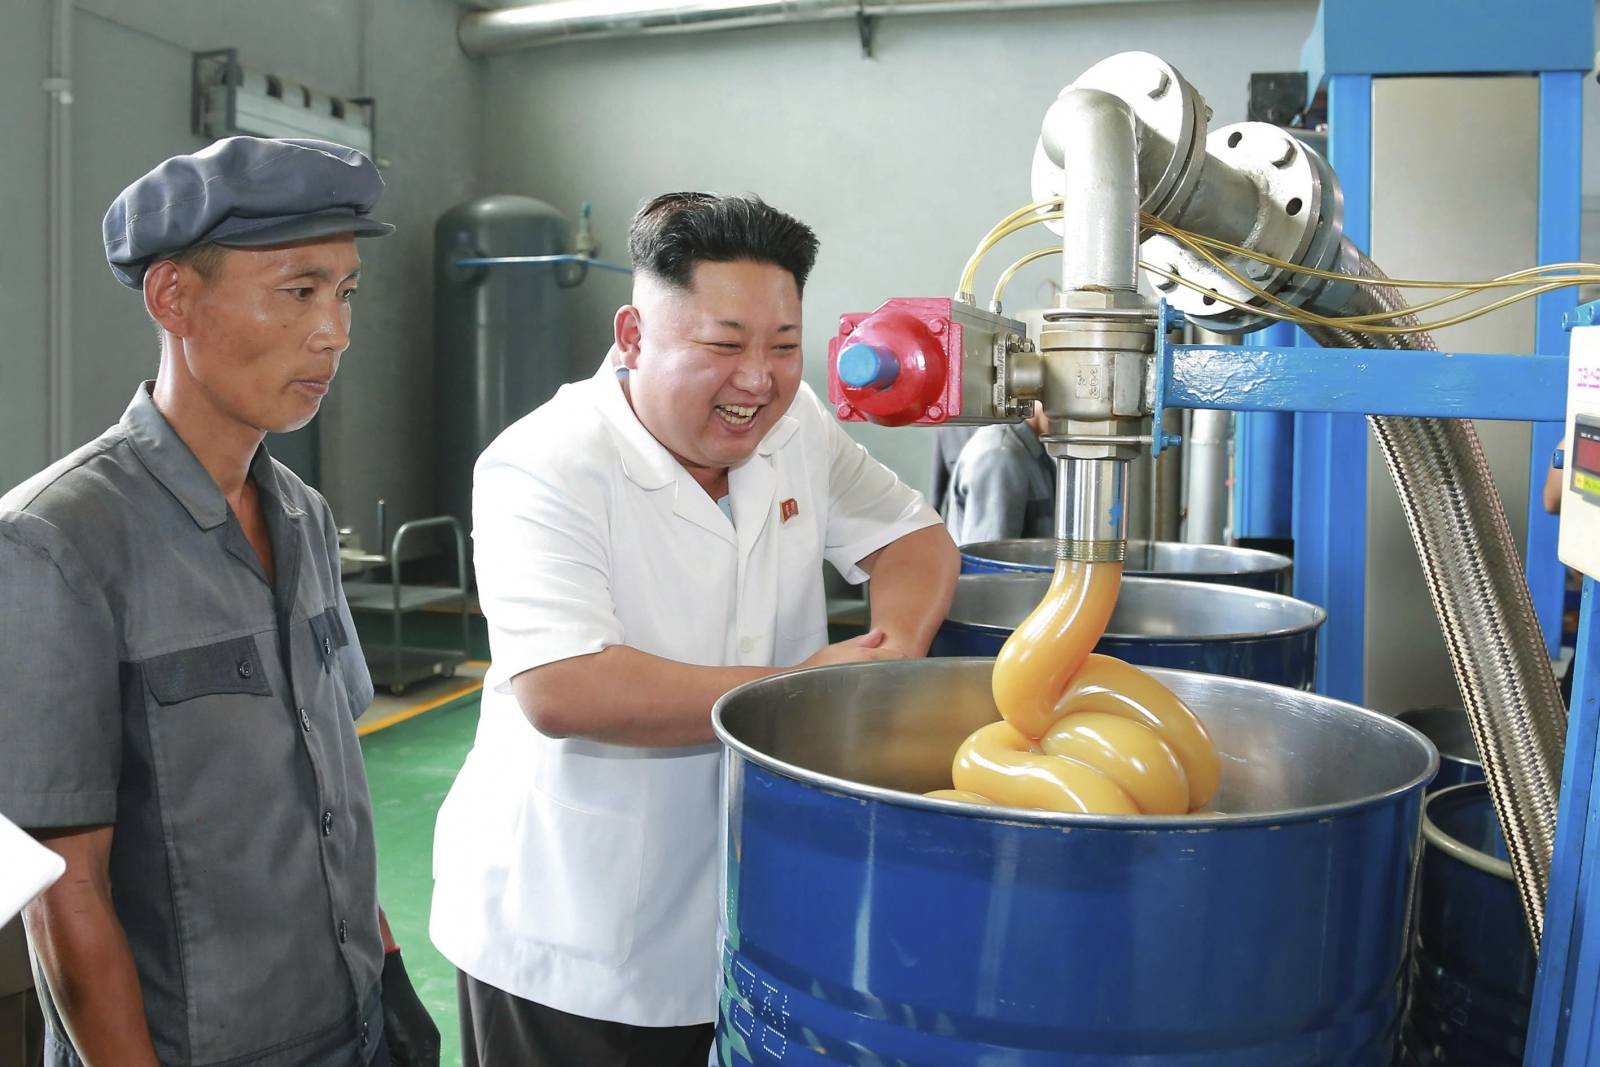 Kim Jong Un at the Chonji Lubricant Factory